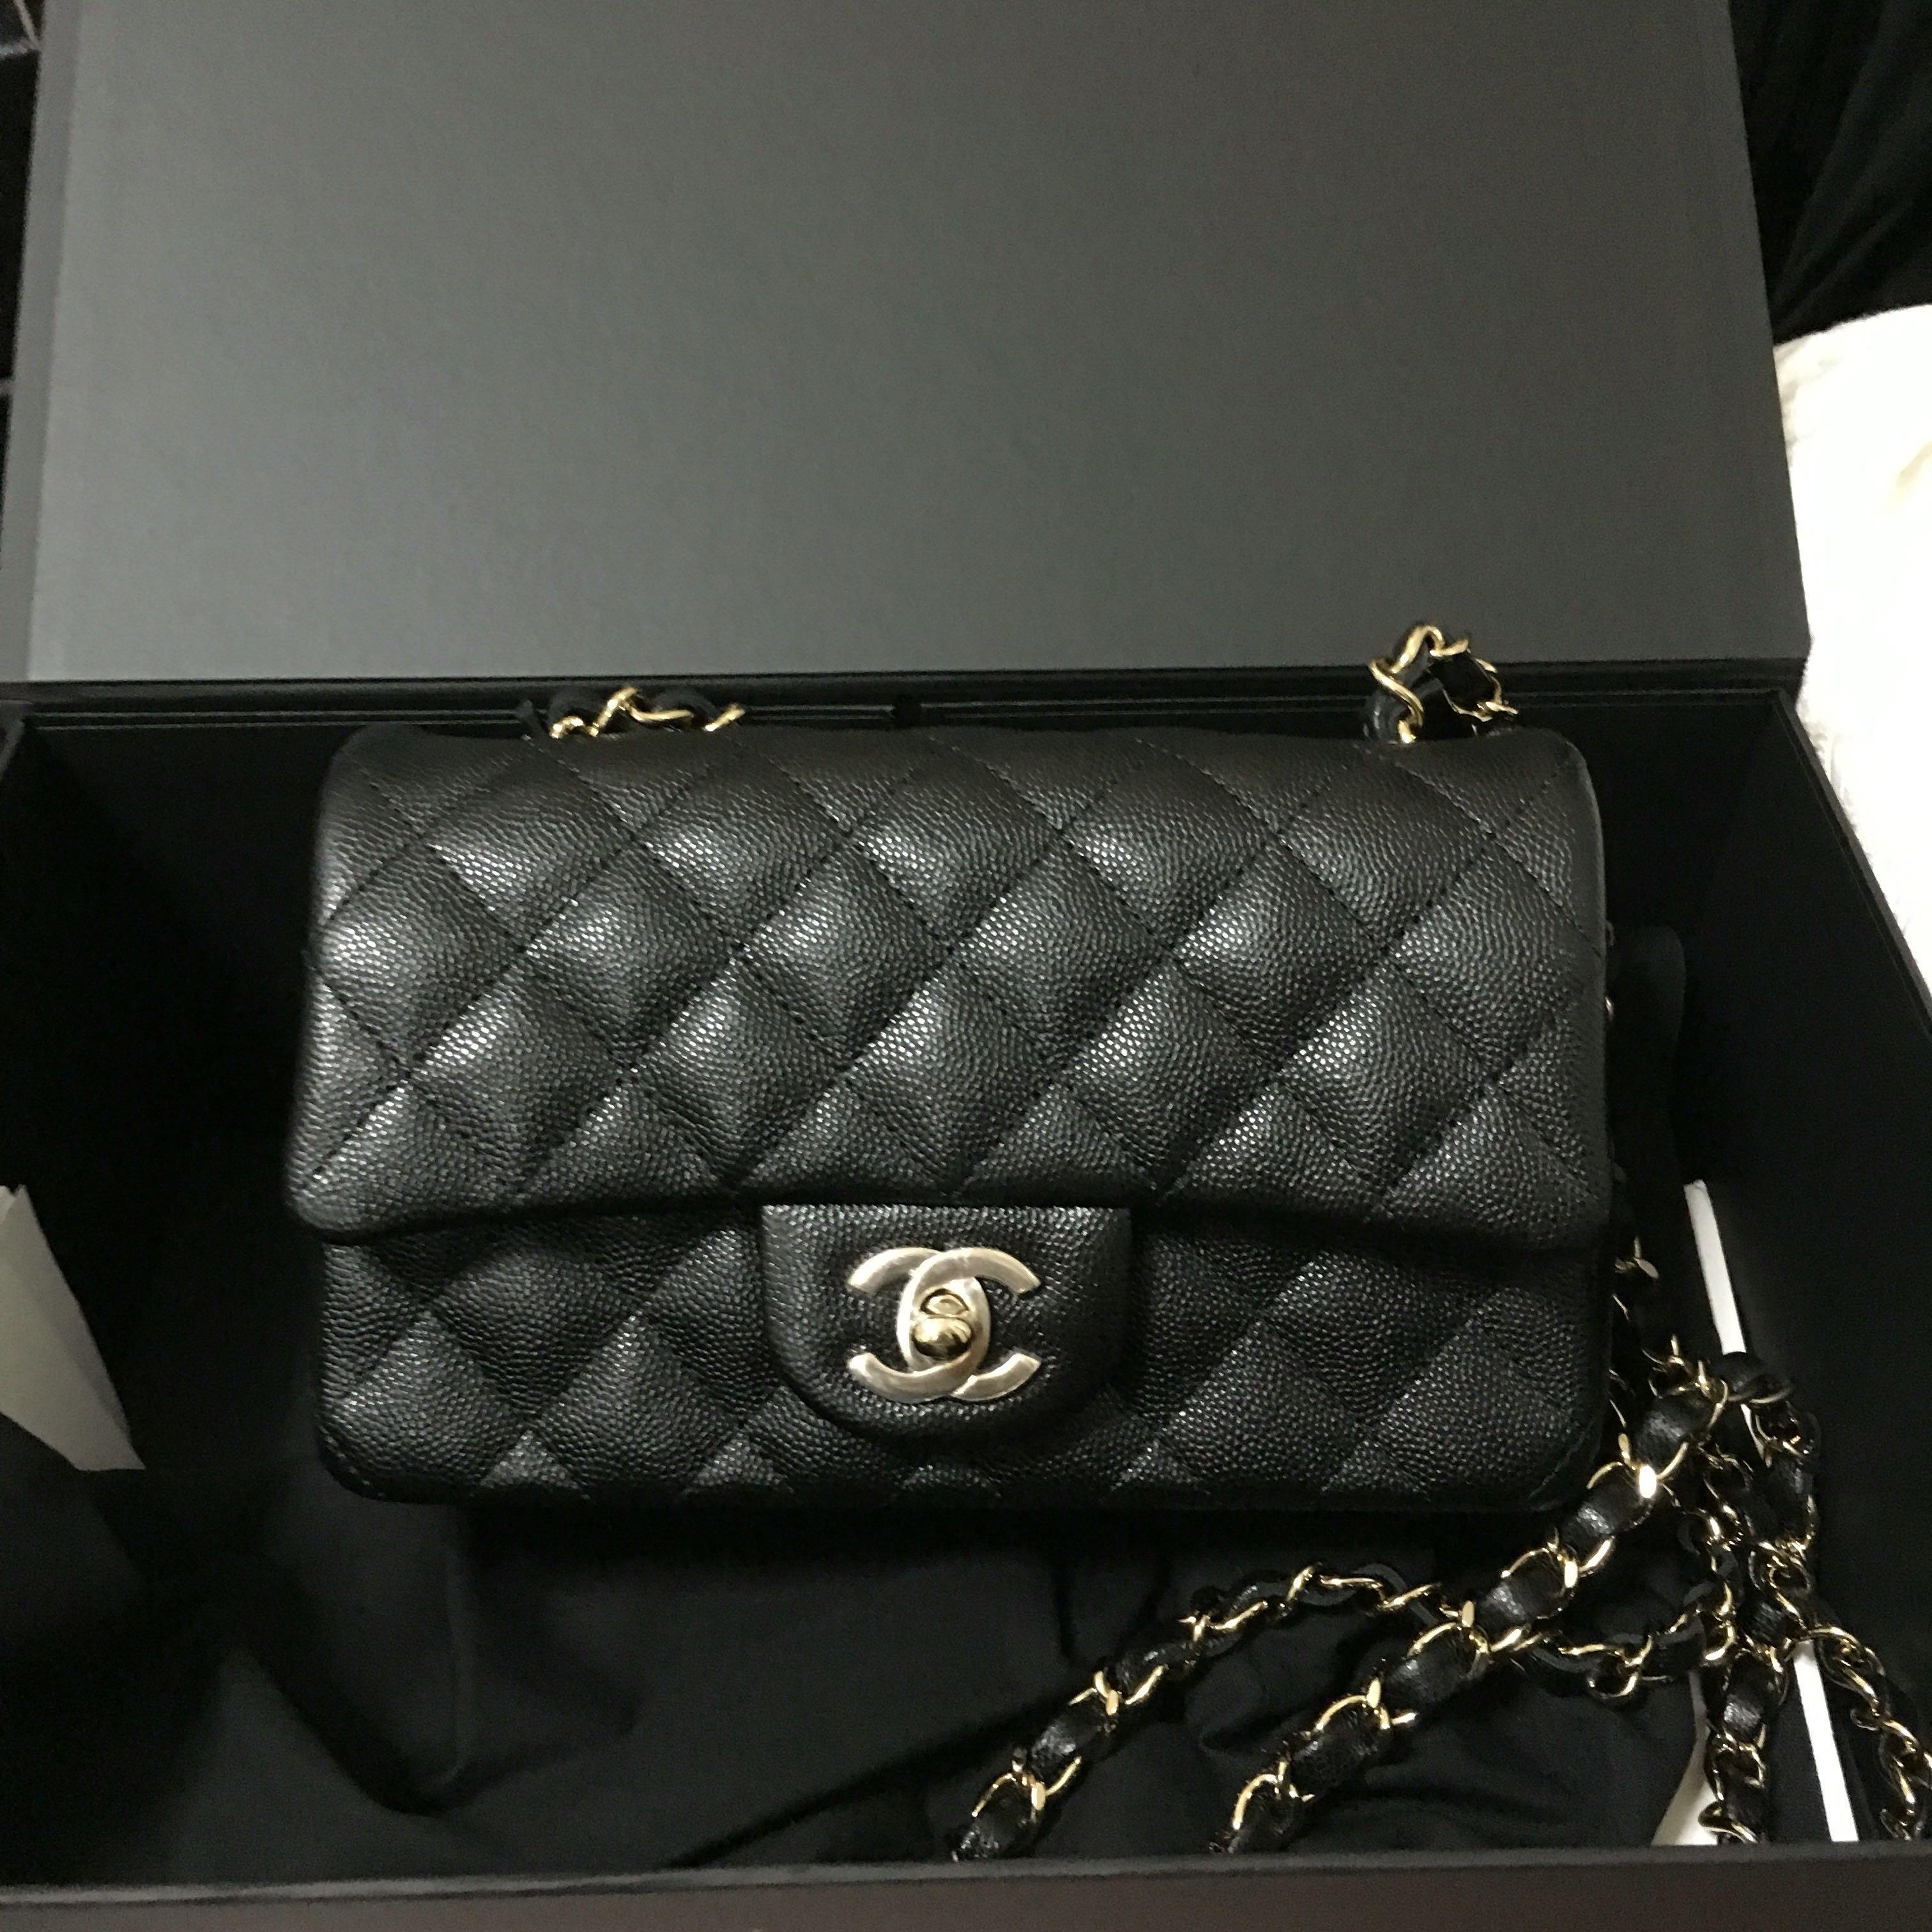 4ef81dbb946232 (SOLD) Chanel Mini Rectangular 18B Black Caviar Champagne GHW, Luxury, Bags  & Wallets, Handbags on Carousell